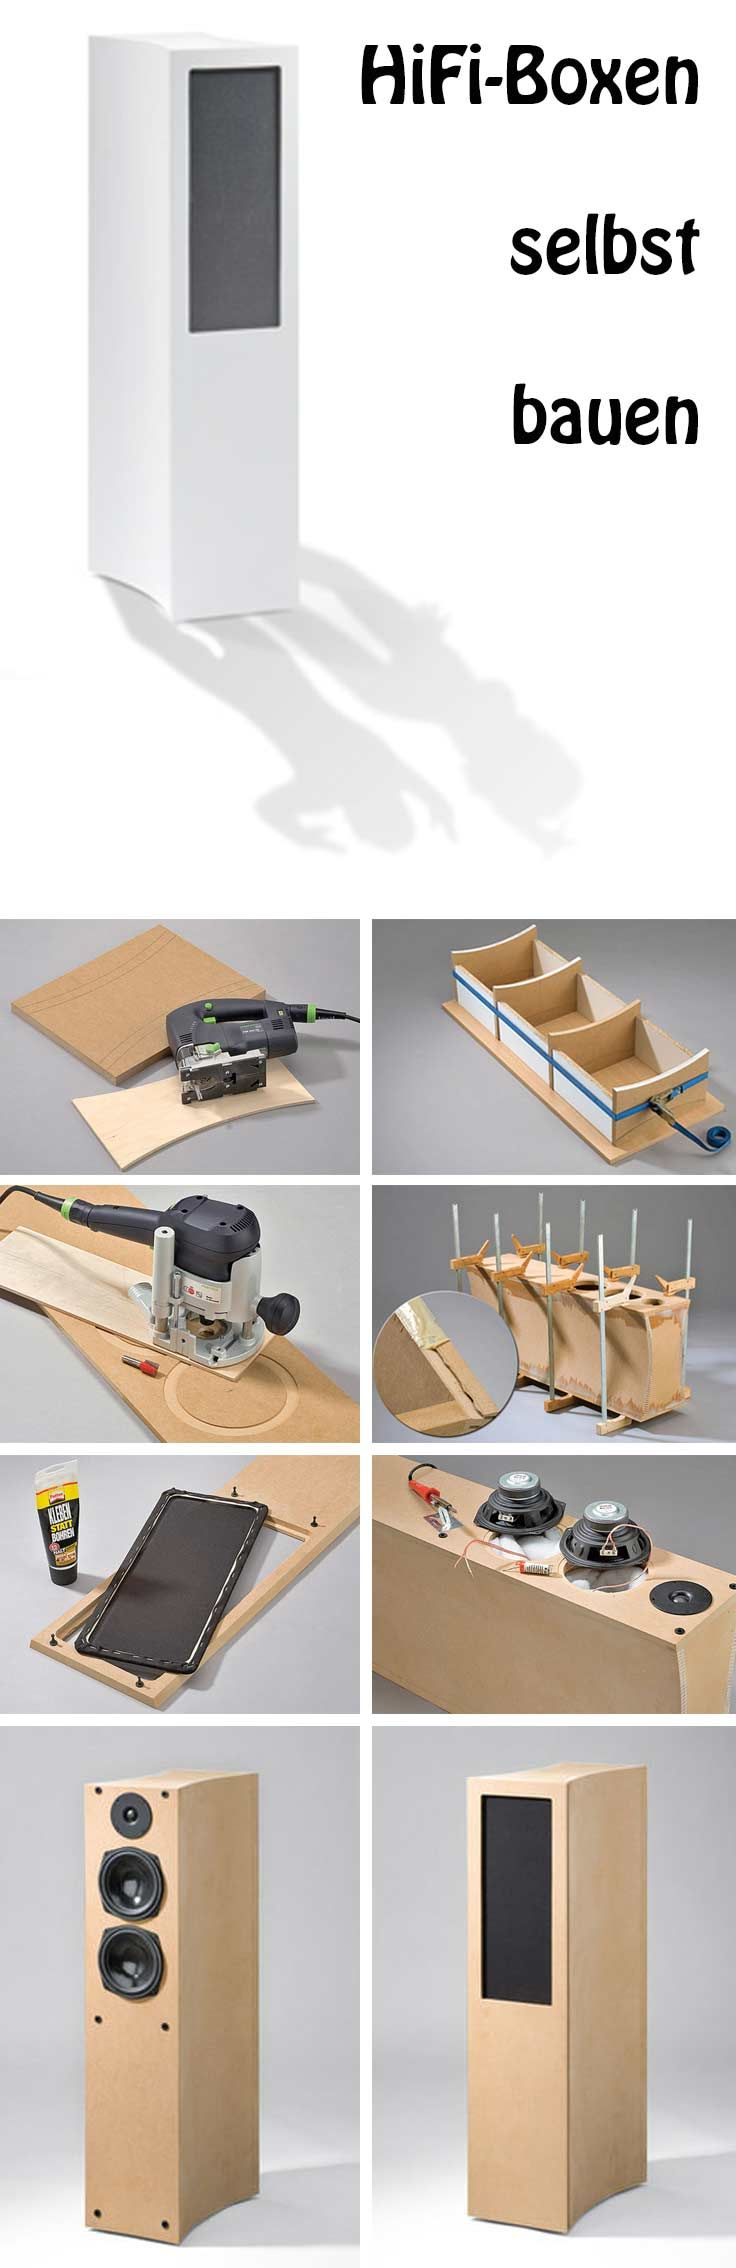 standboxen selber bauen m bel holz pinterest box selber bauen und hifi boxen. Black Bedroom Furniture Sets. Home Design Ideas